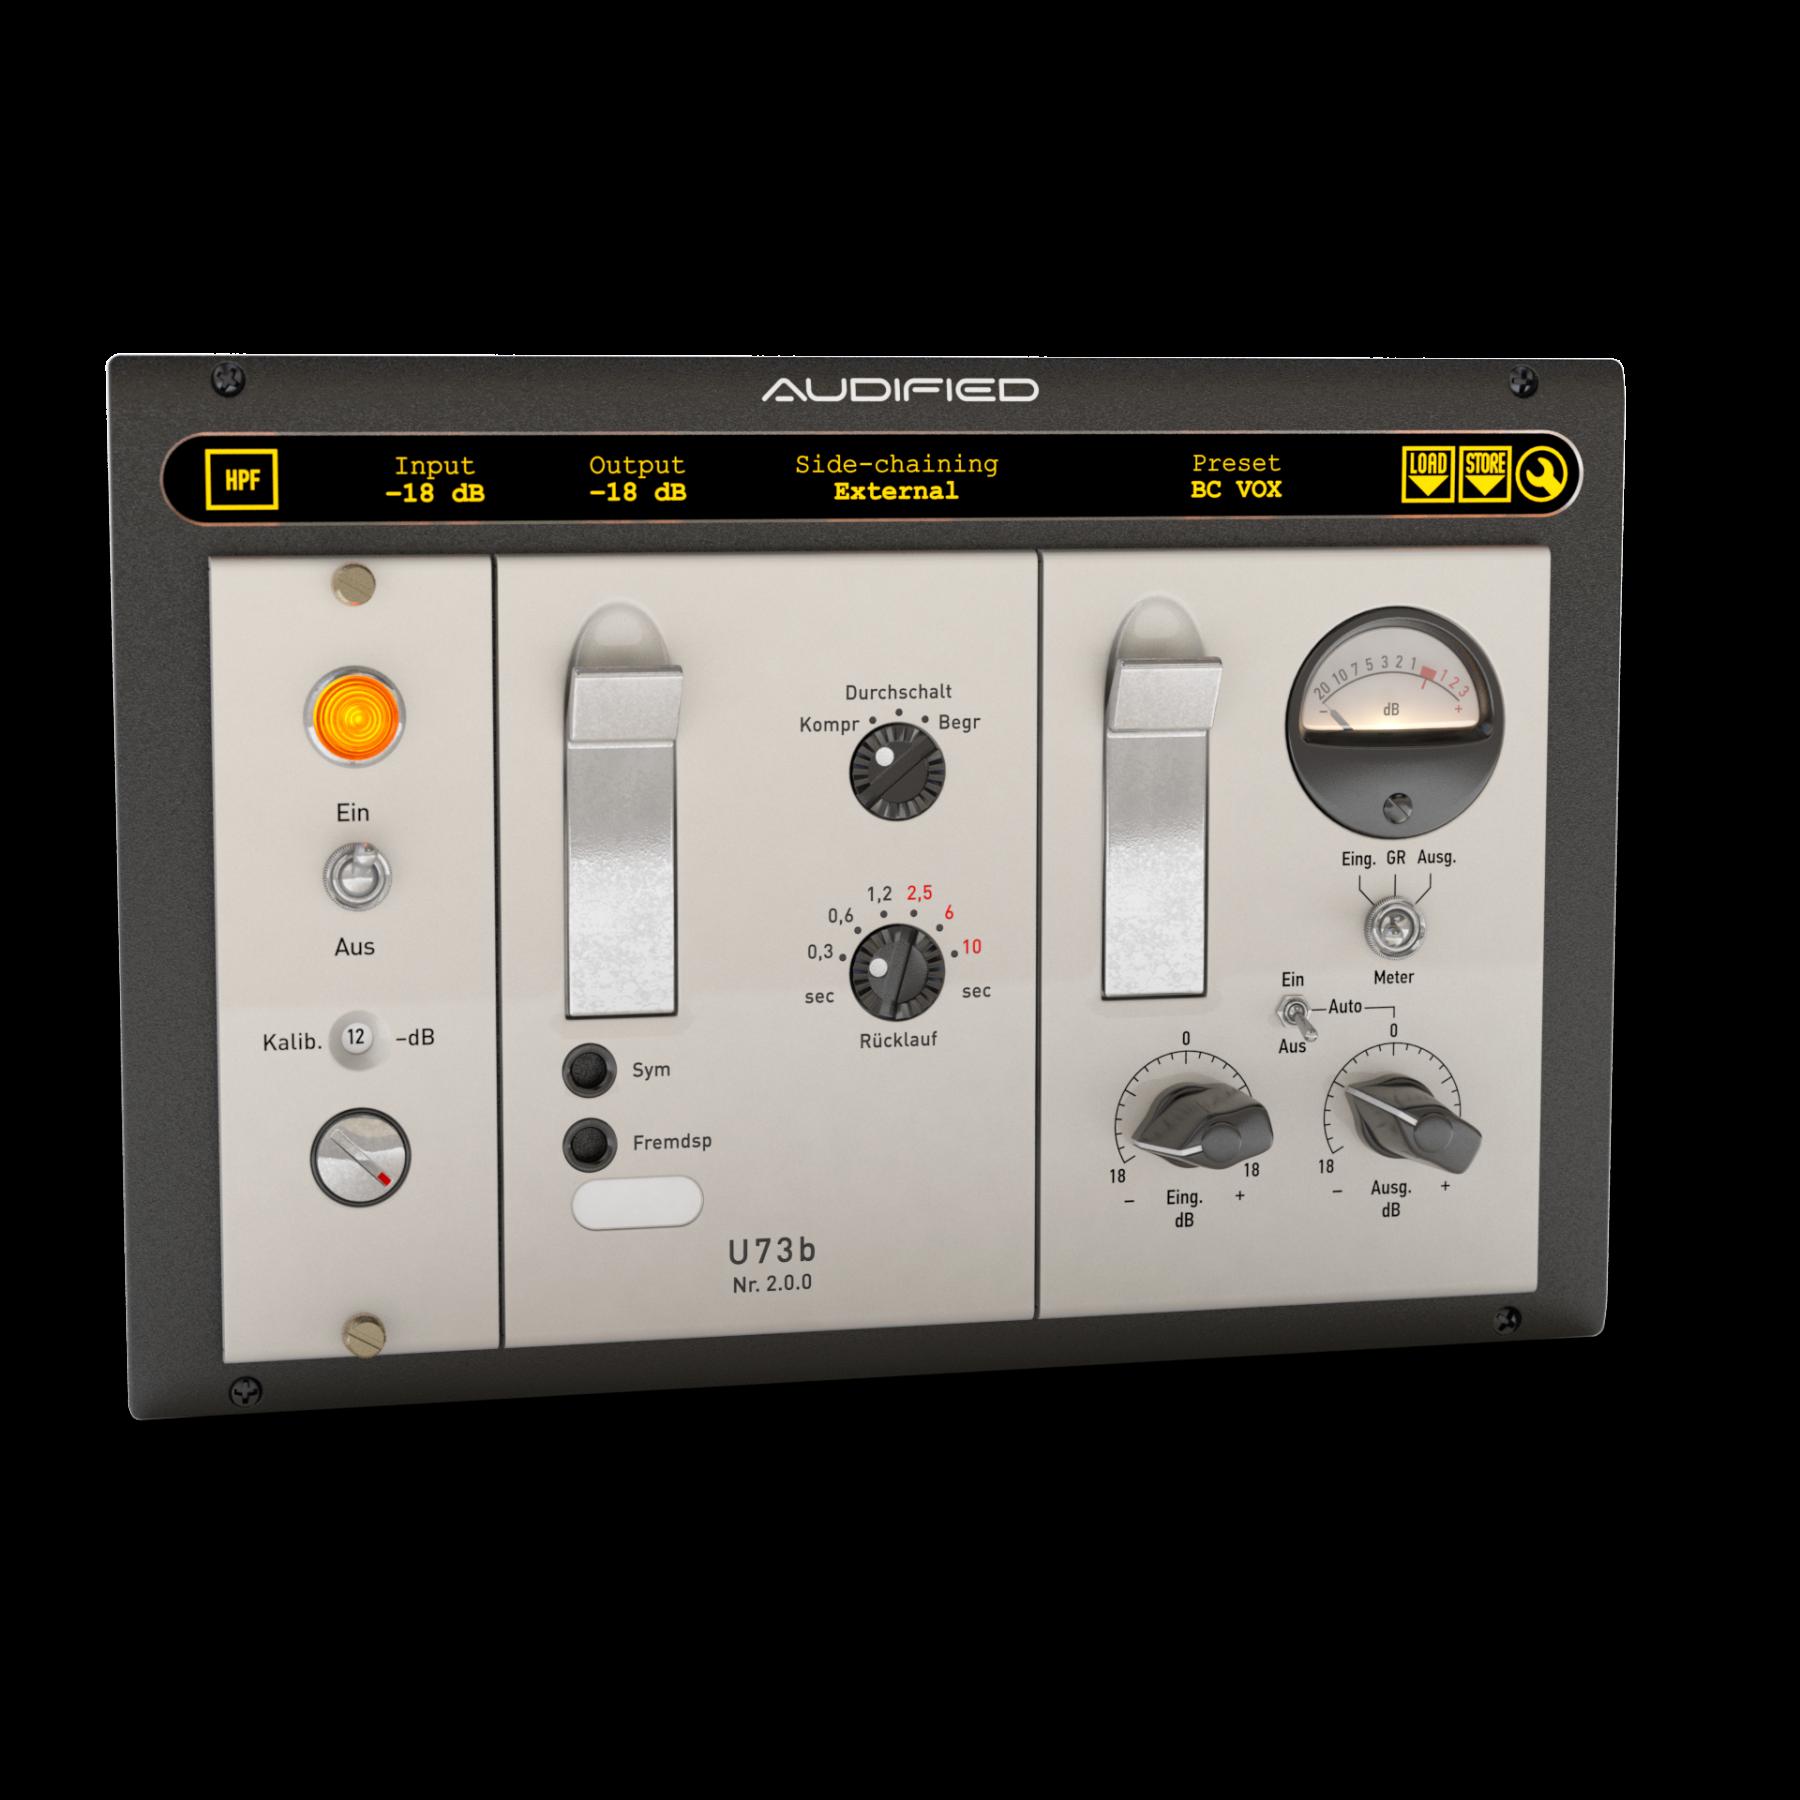 Audified U73b 压缩器演示